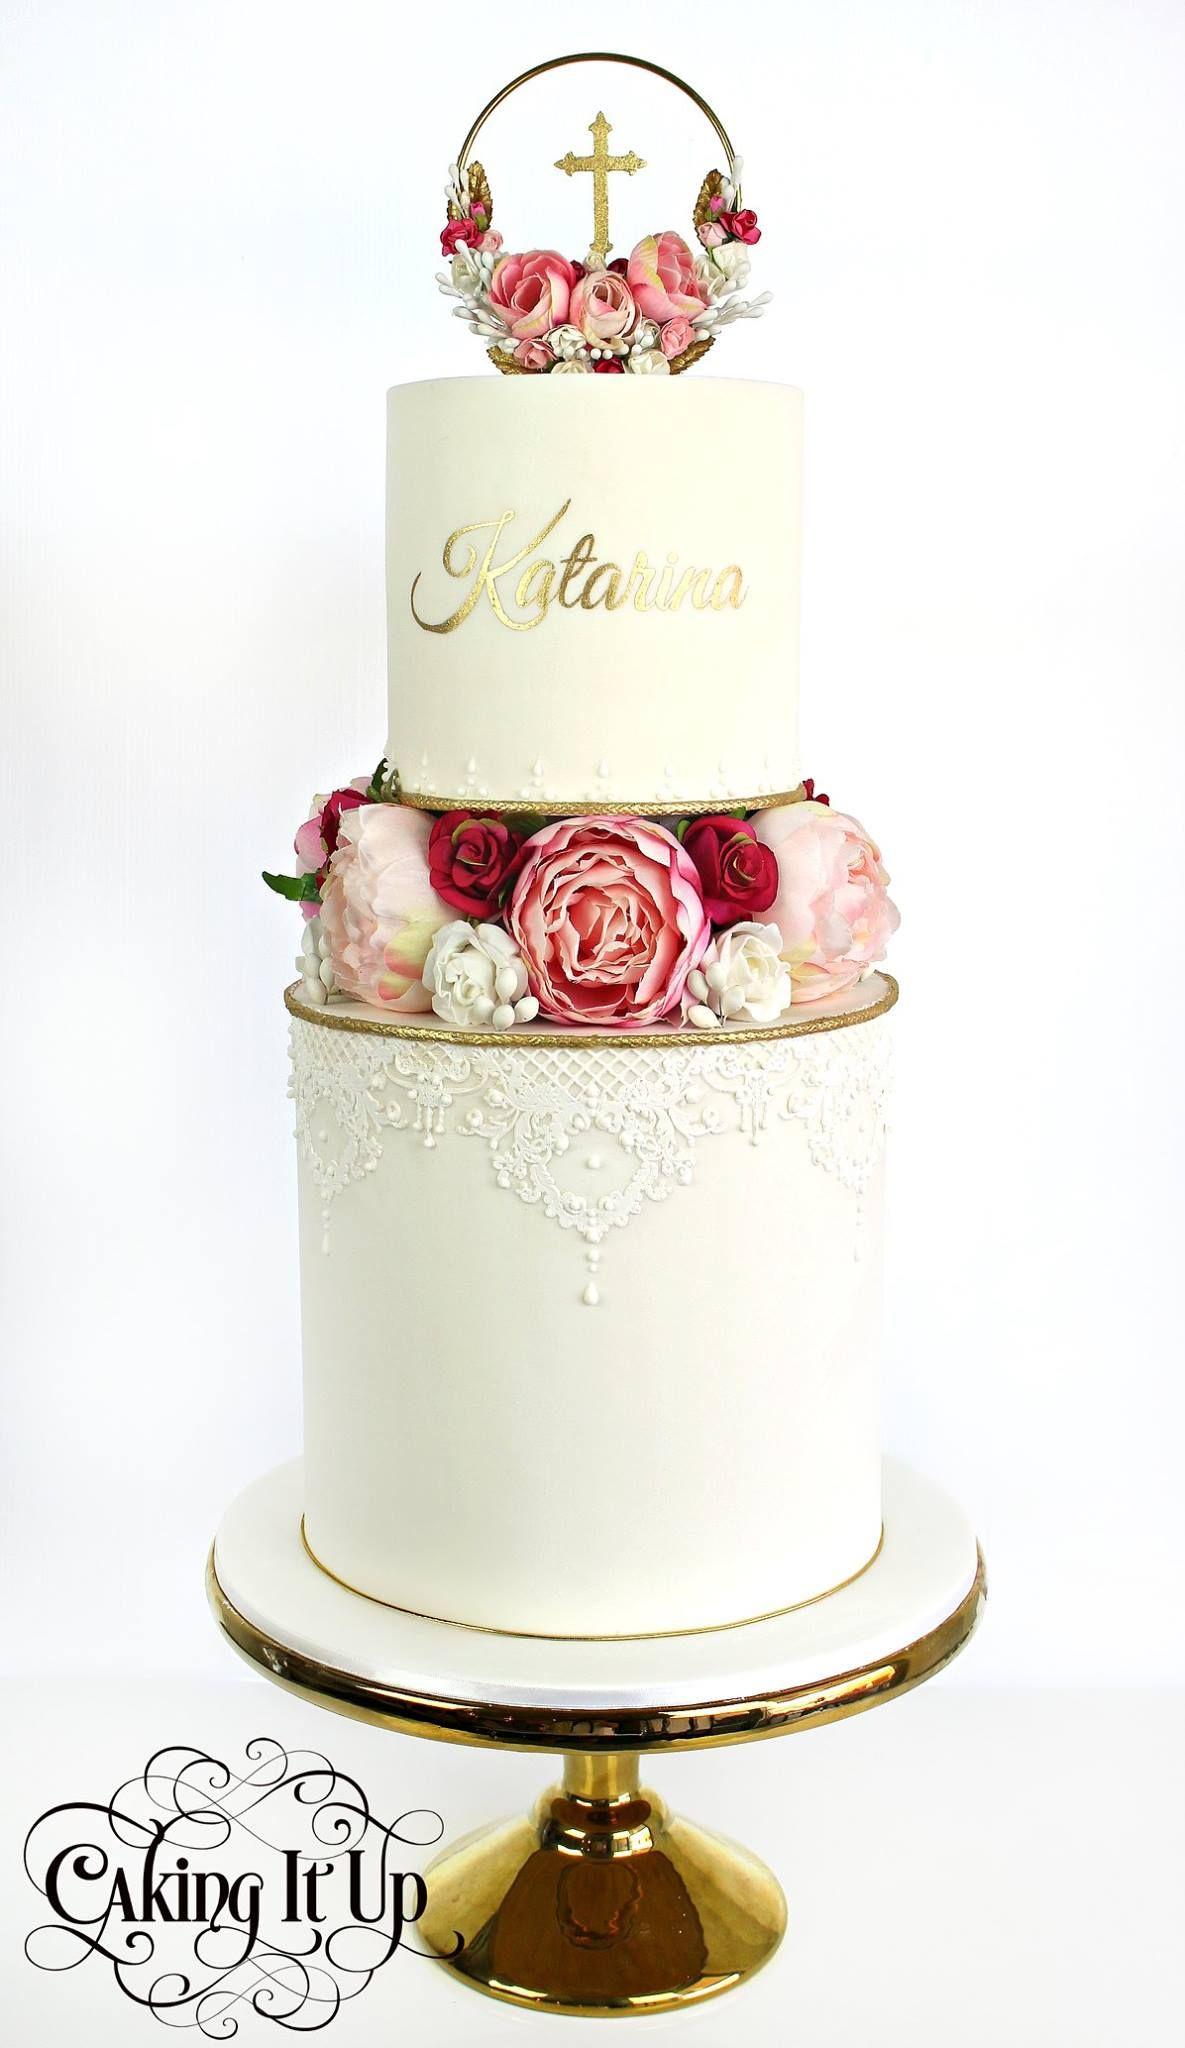 Caking It Up | Cakes - Elegant in 2019 | Religious cakes